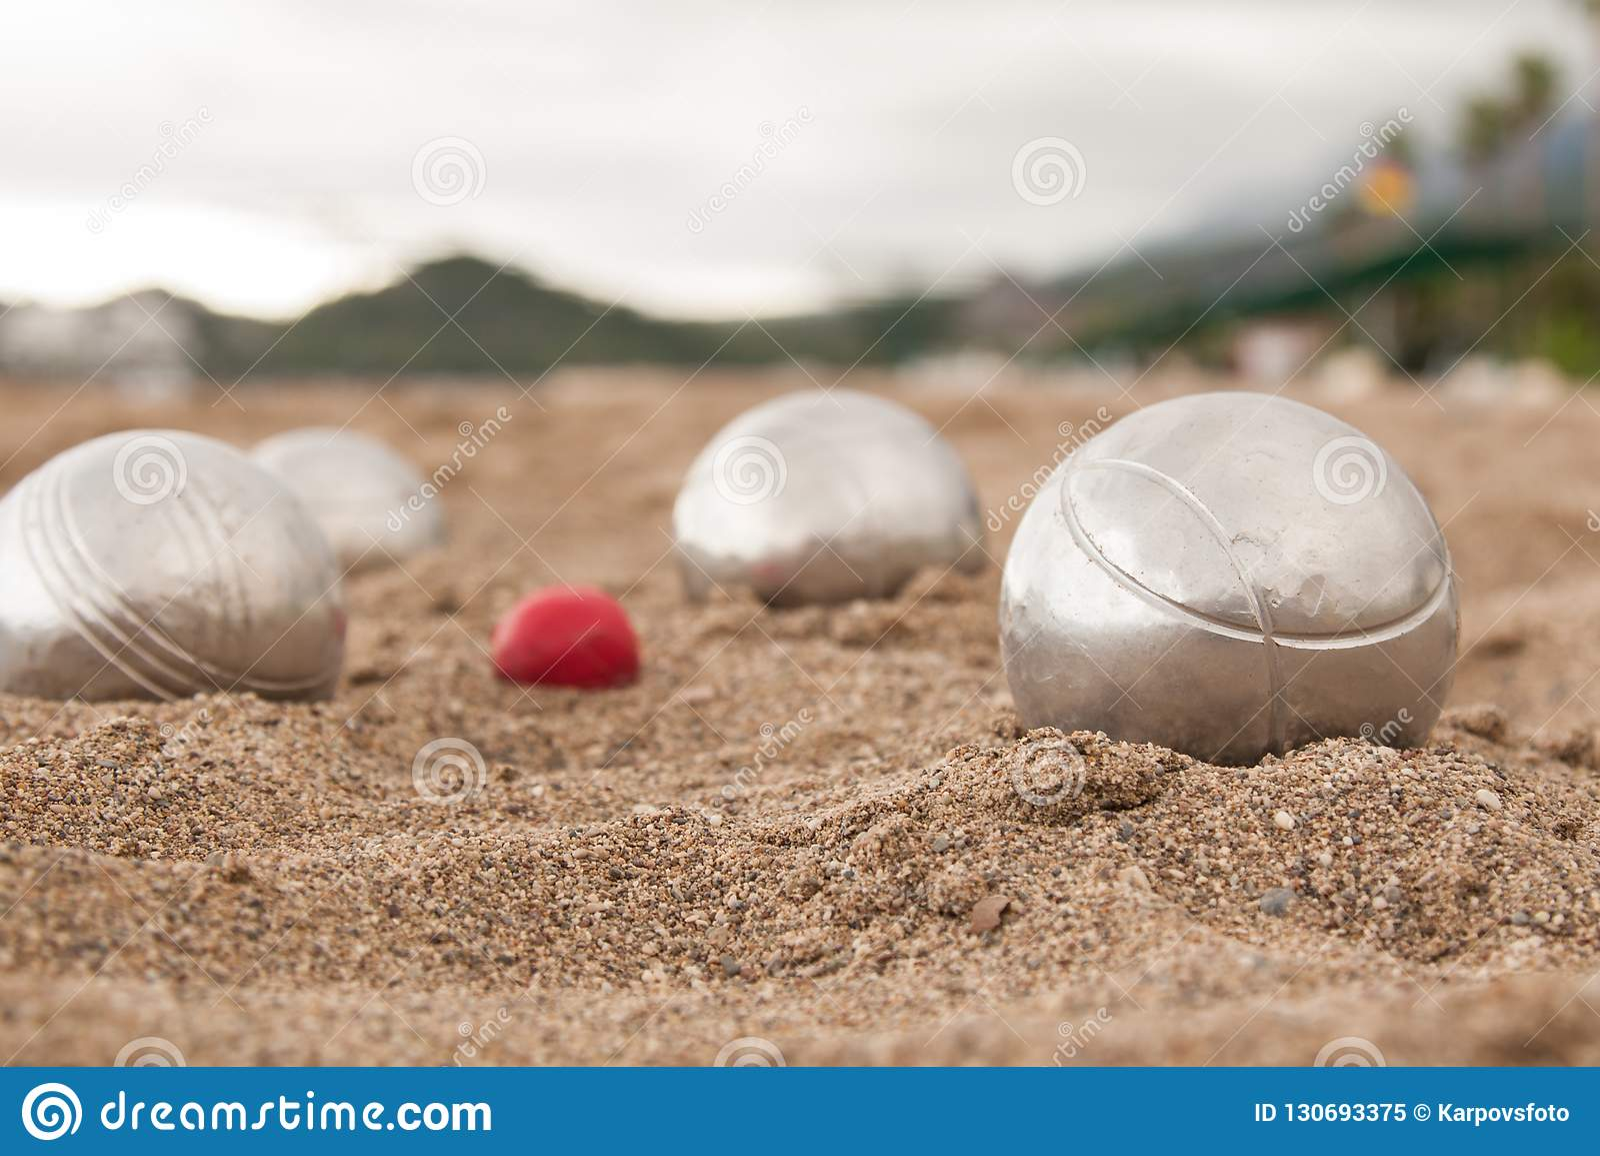 Brilliant silver balls for a bocha on the sand.